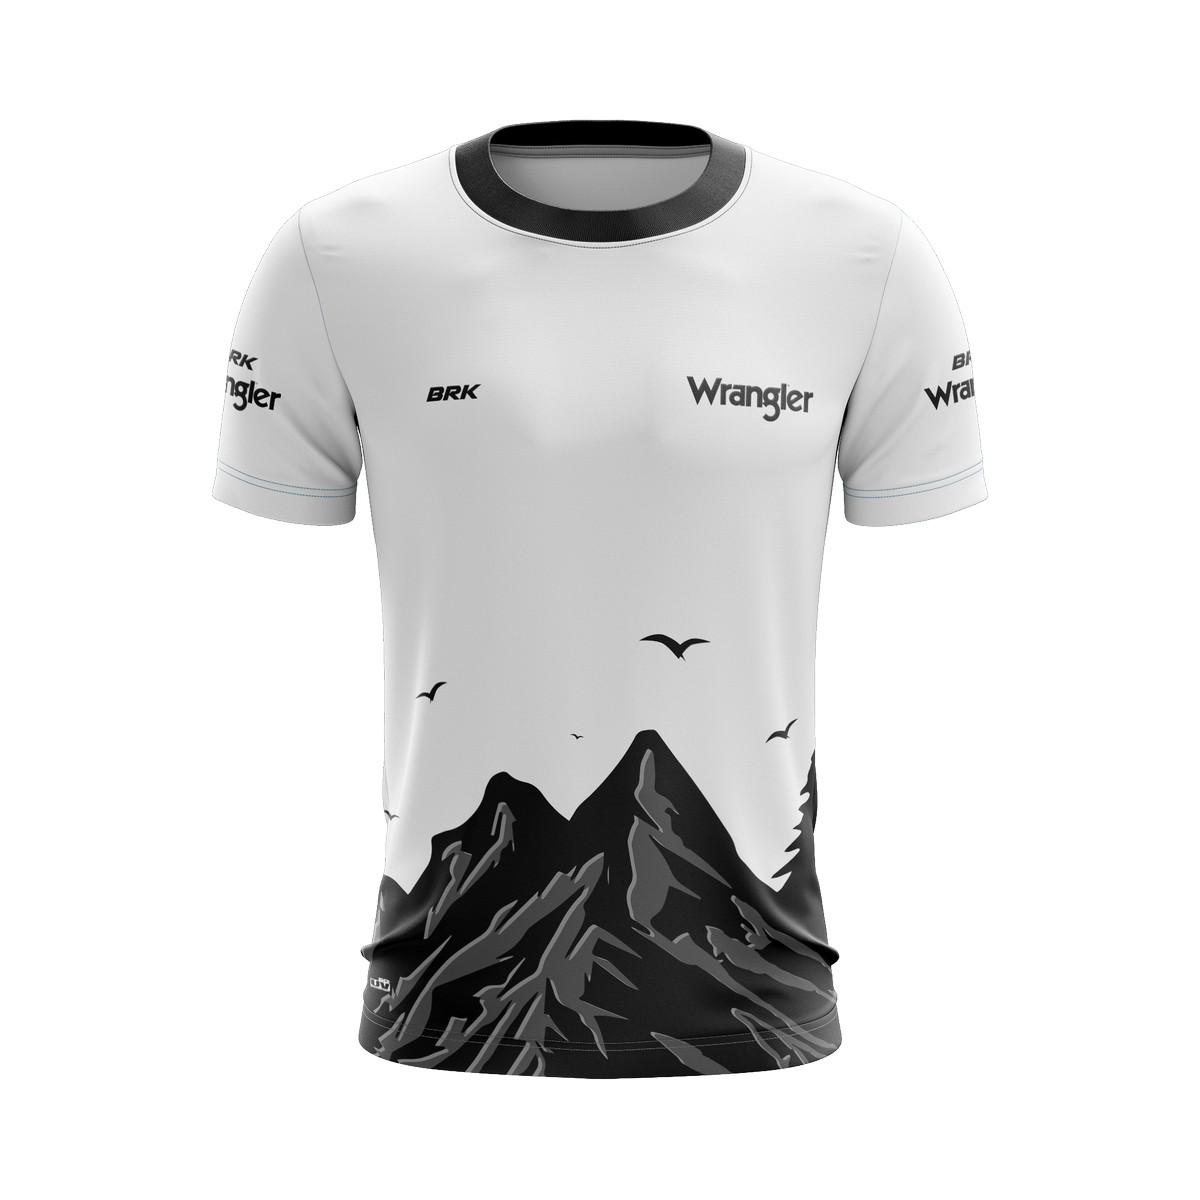 Camiseta Wrangler Casual 03 Brk Off Road Tecido Dry